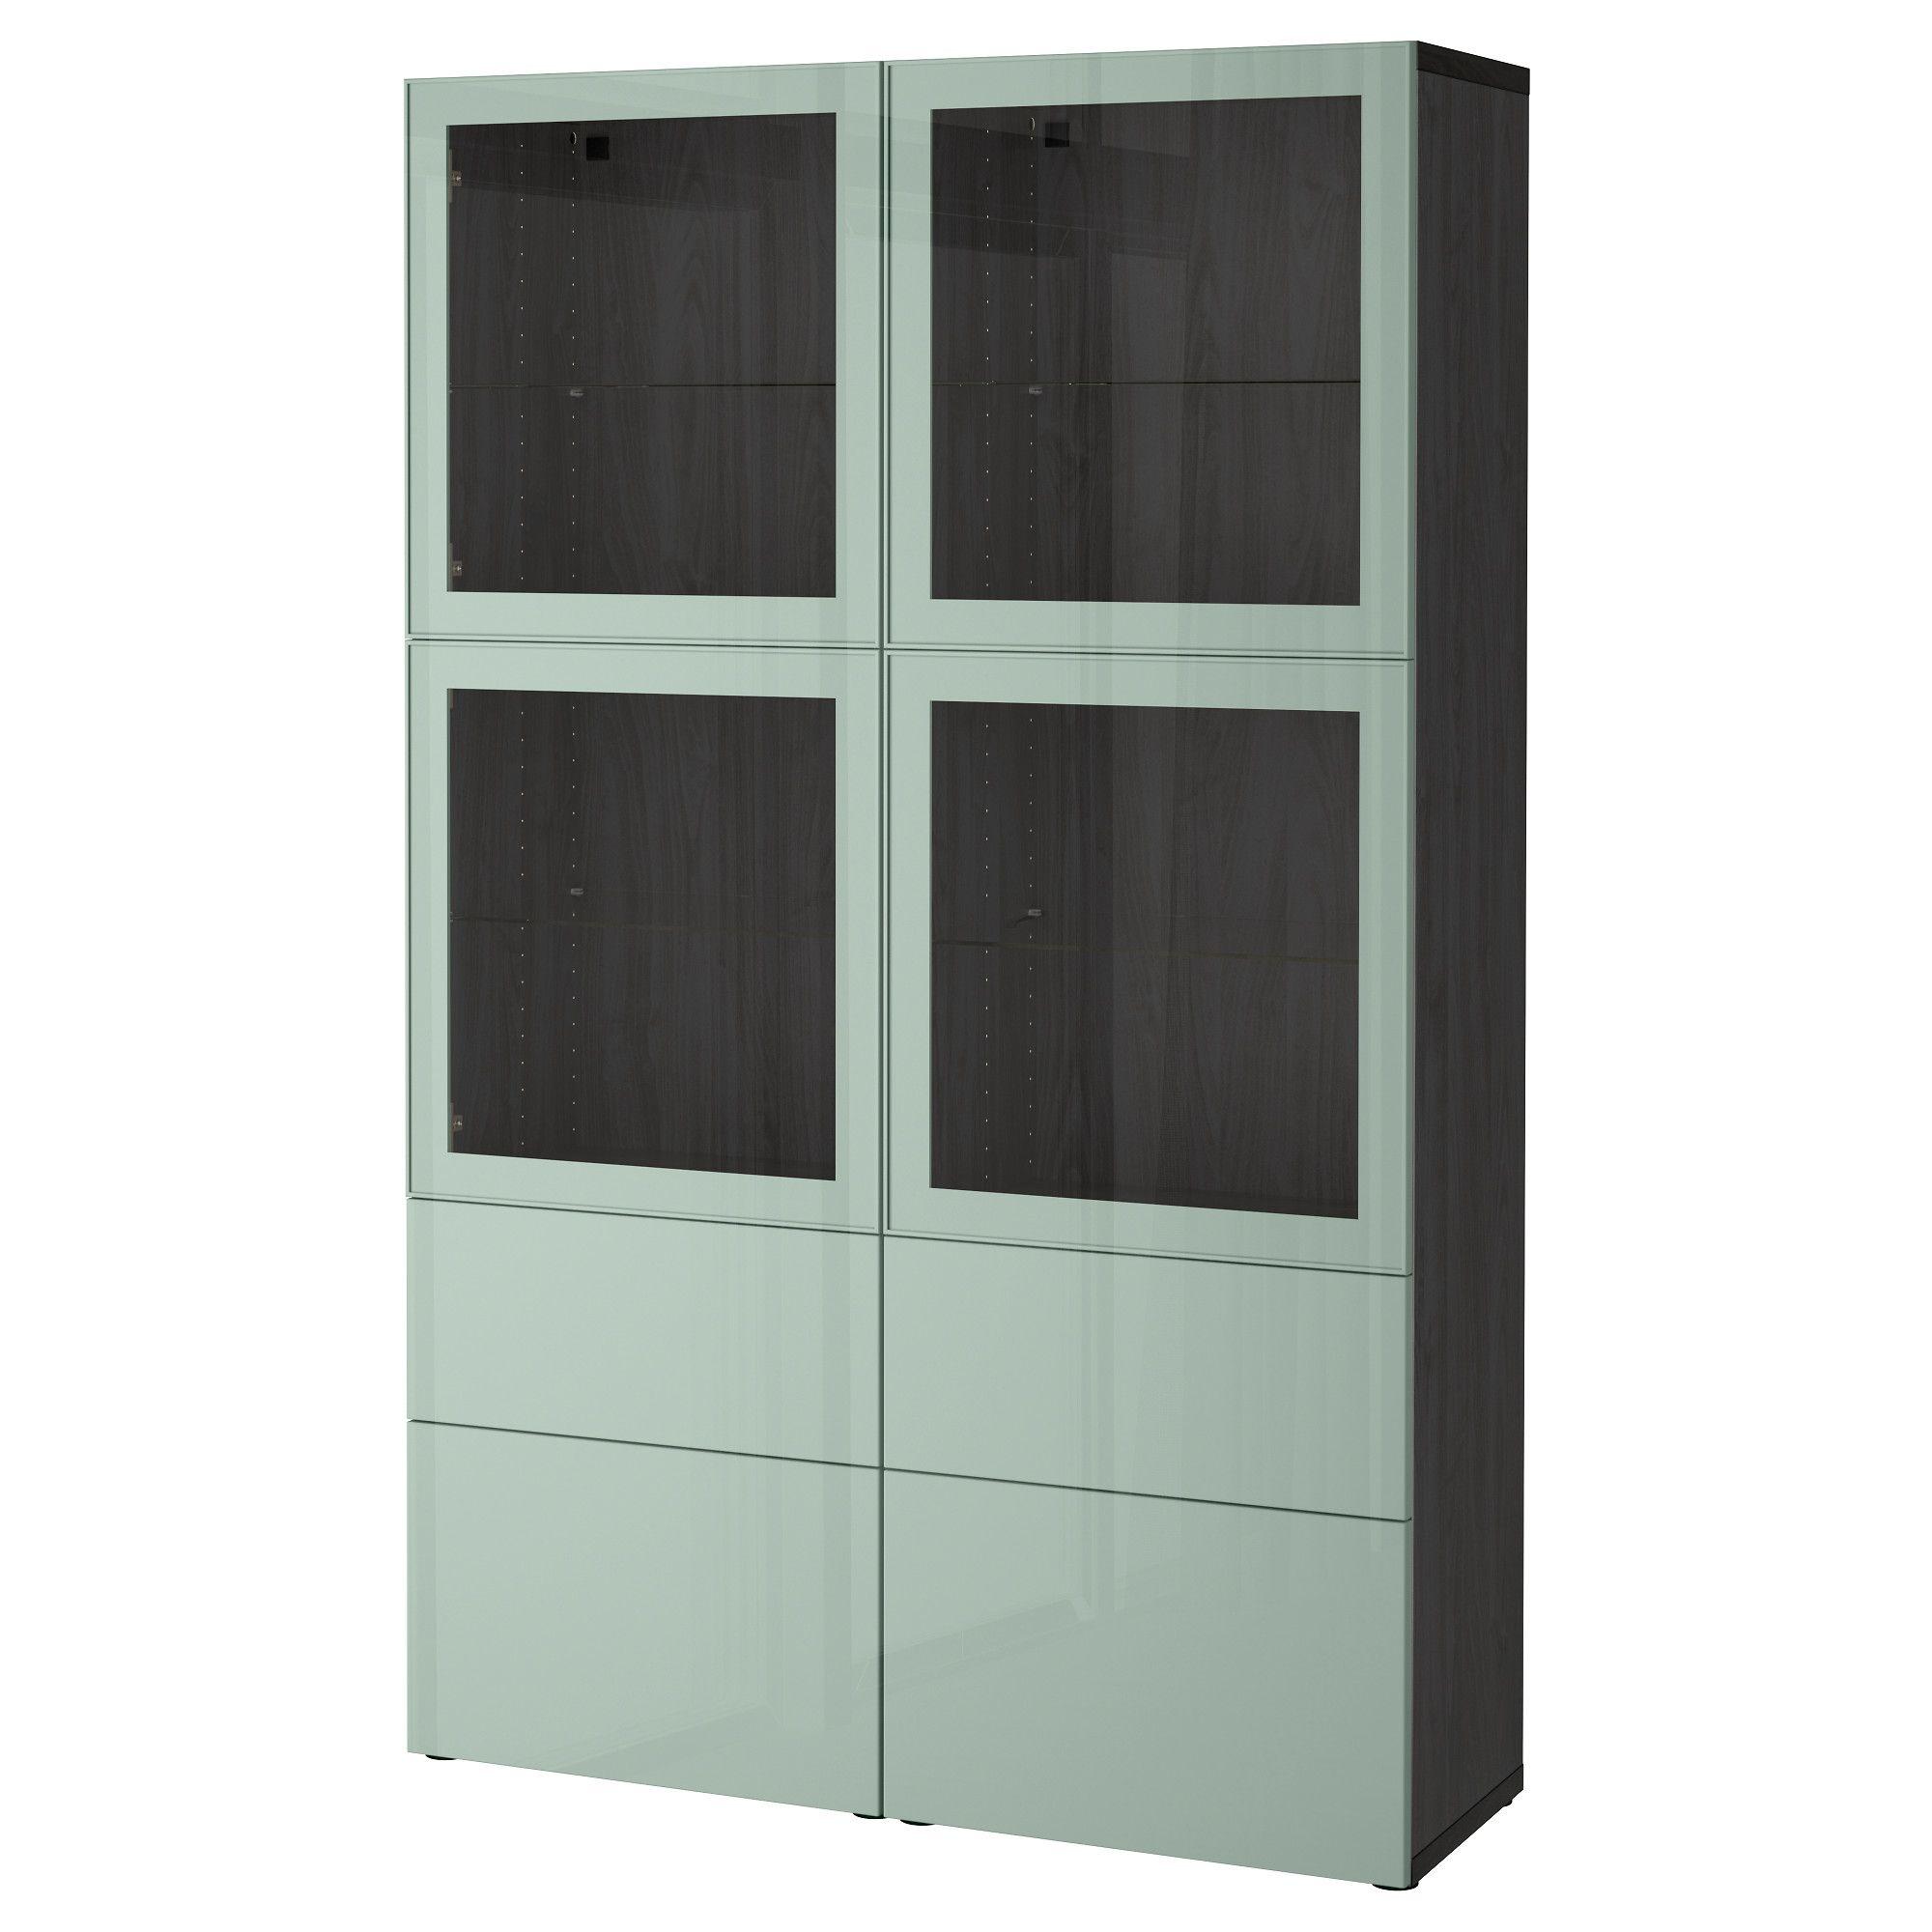 Best Storage Combination Wglass Doors Black Brown Selsviken High